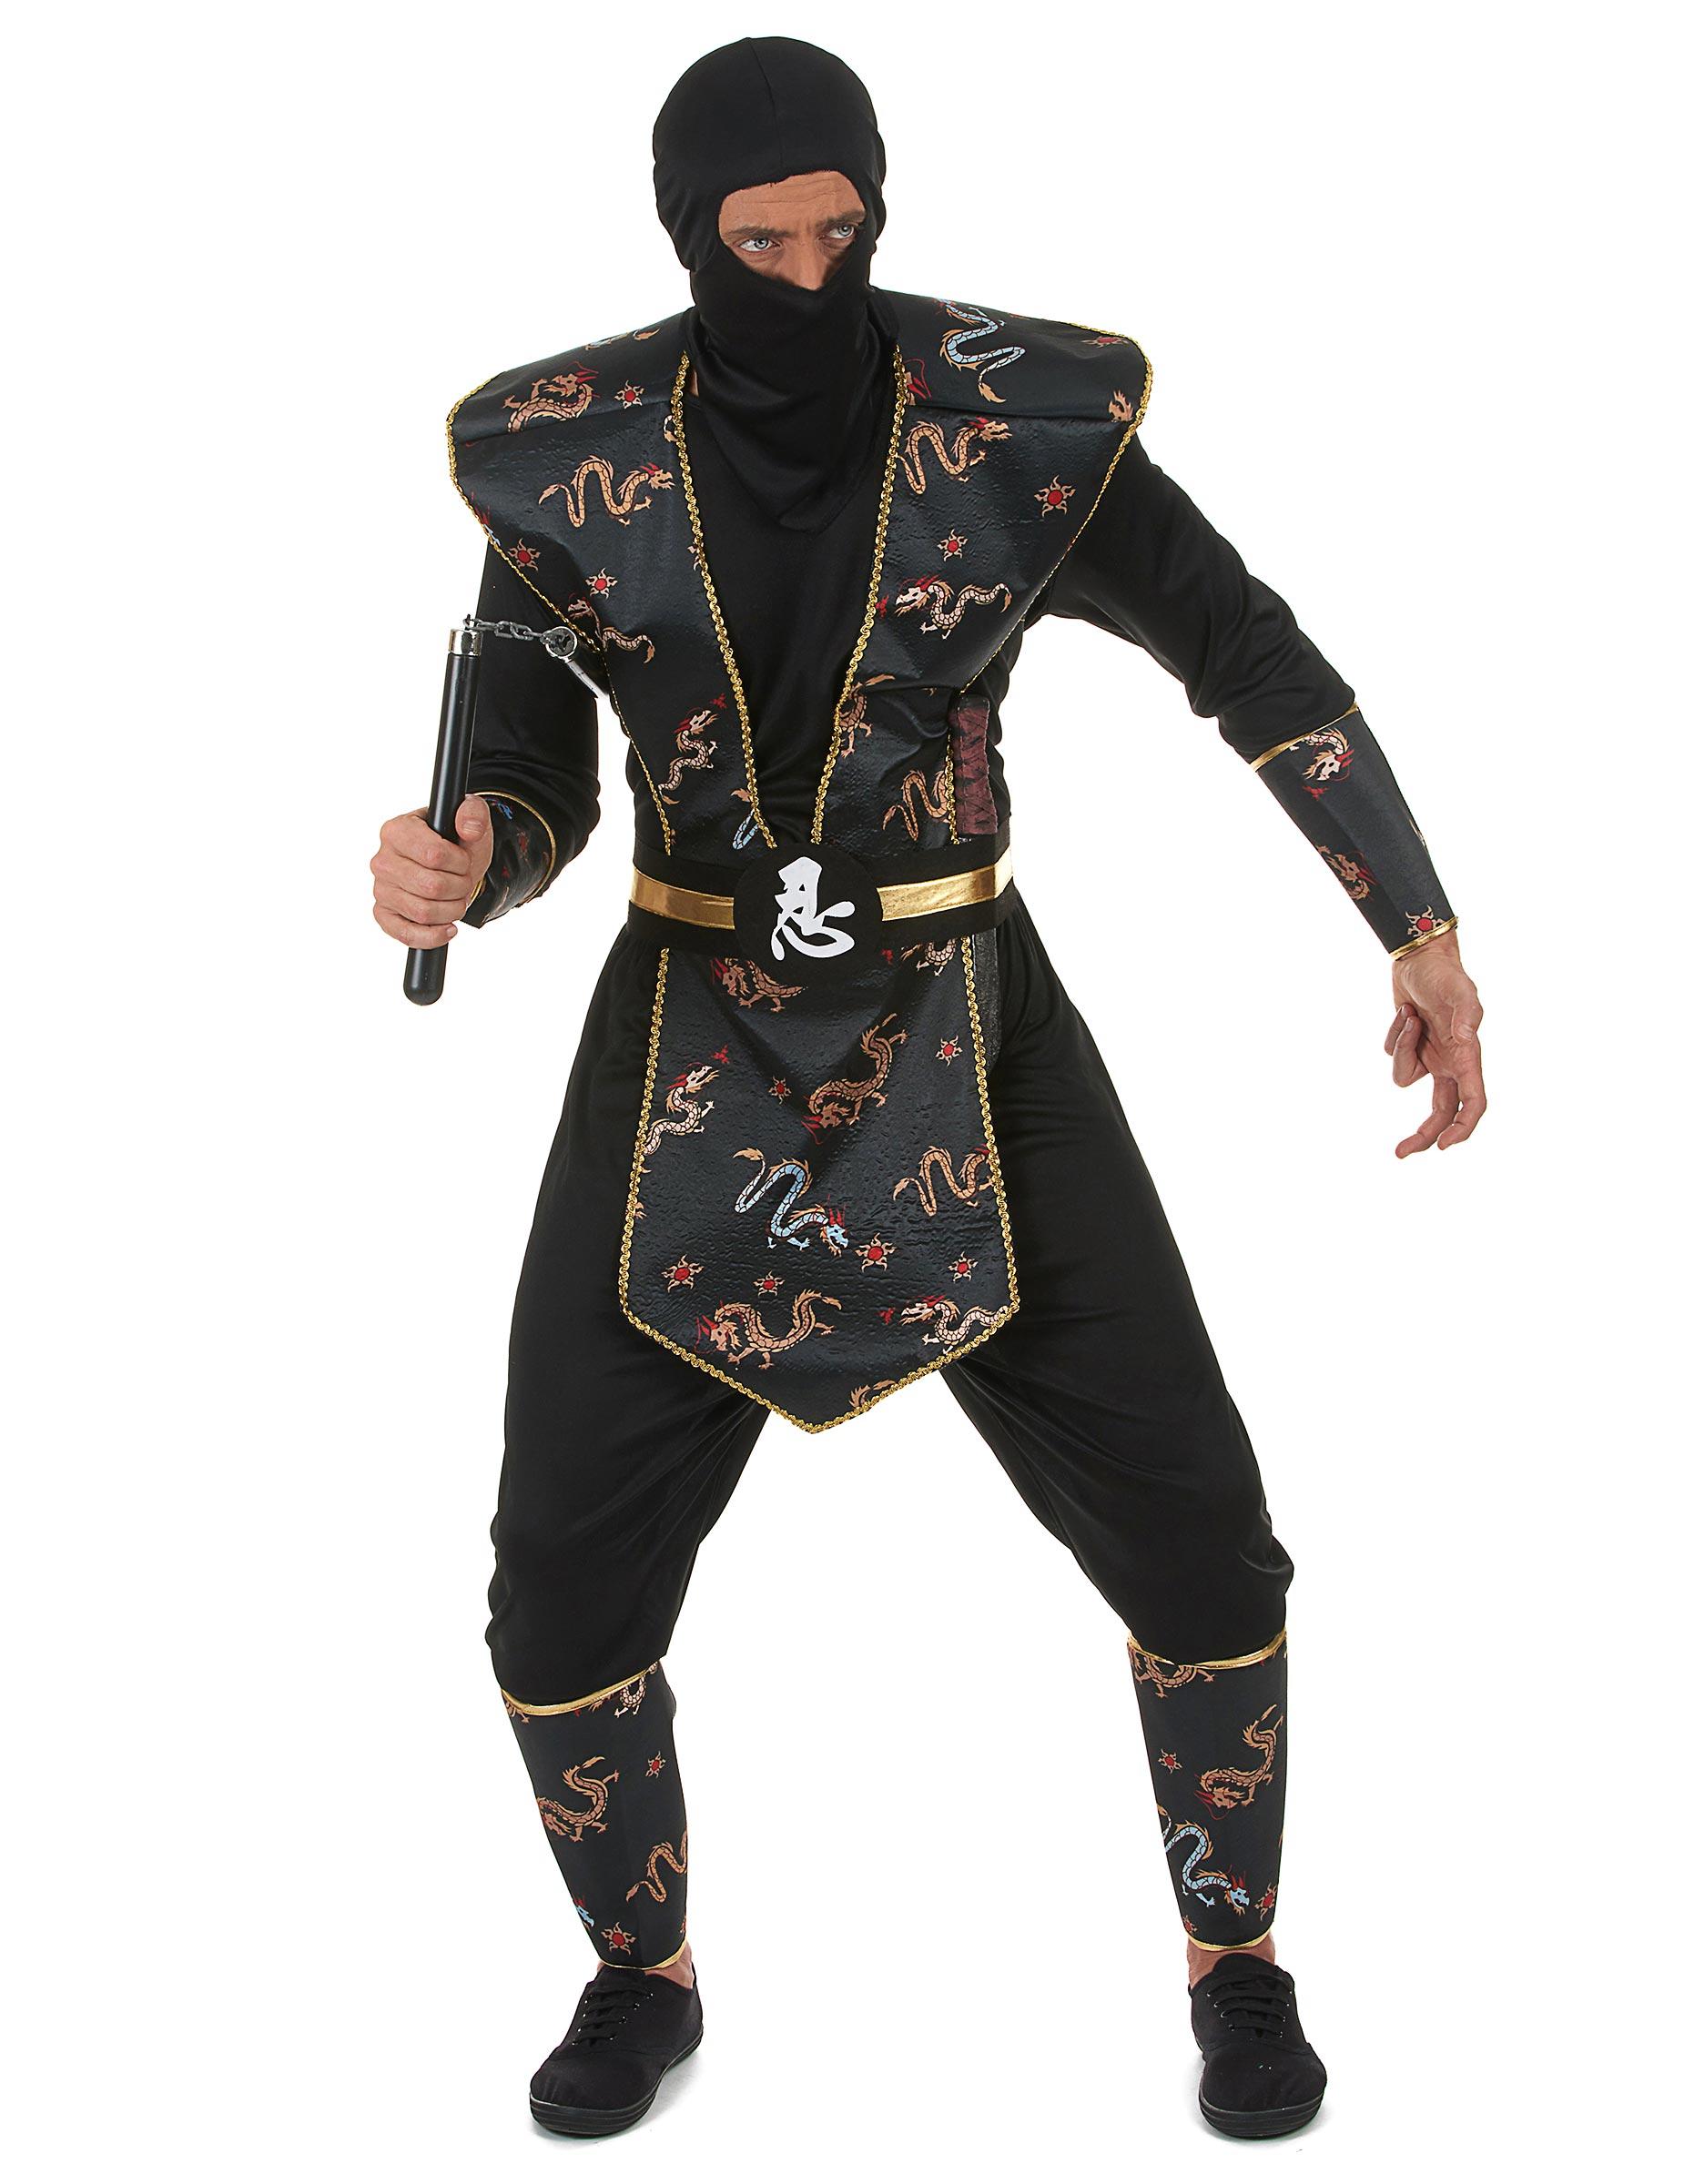 f10d3bac5a49d Déguisement ninja dragon d or homme   Deguise-toi